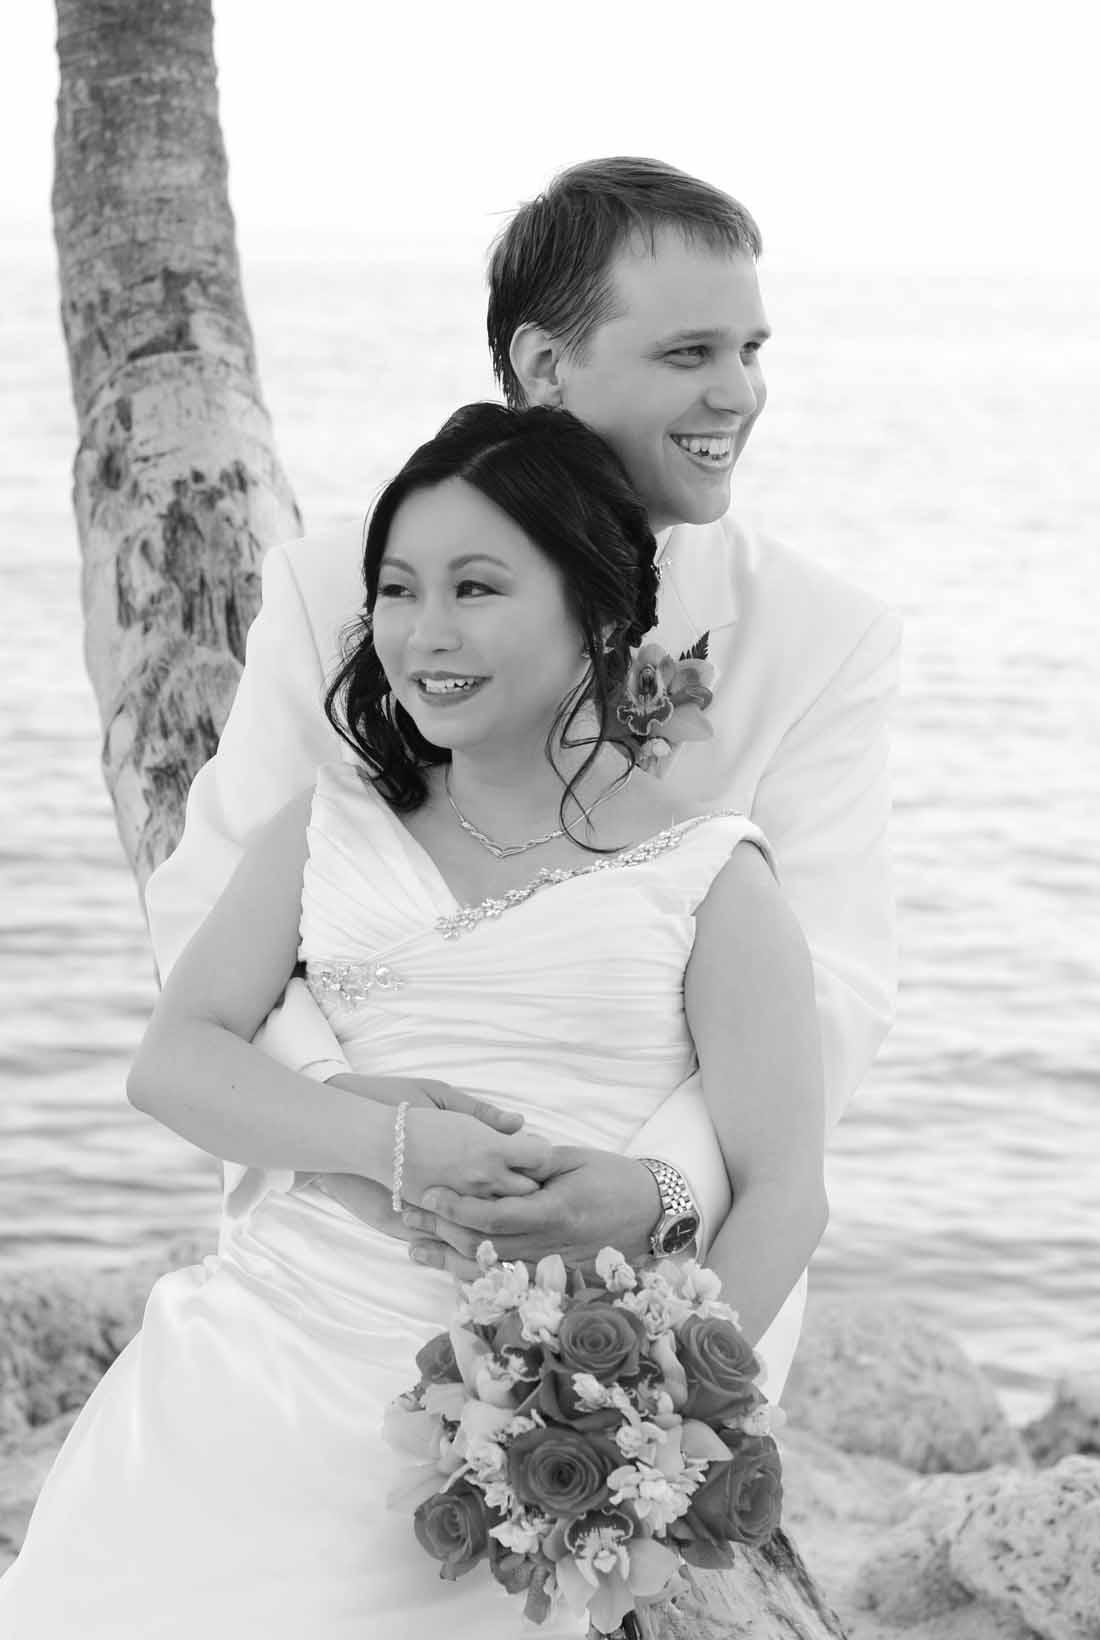 C 2016 MPV Intimate Weddings (7).jpg